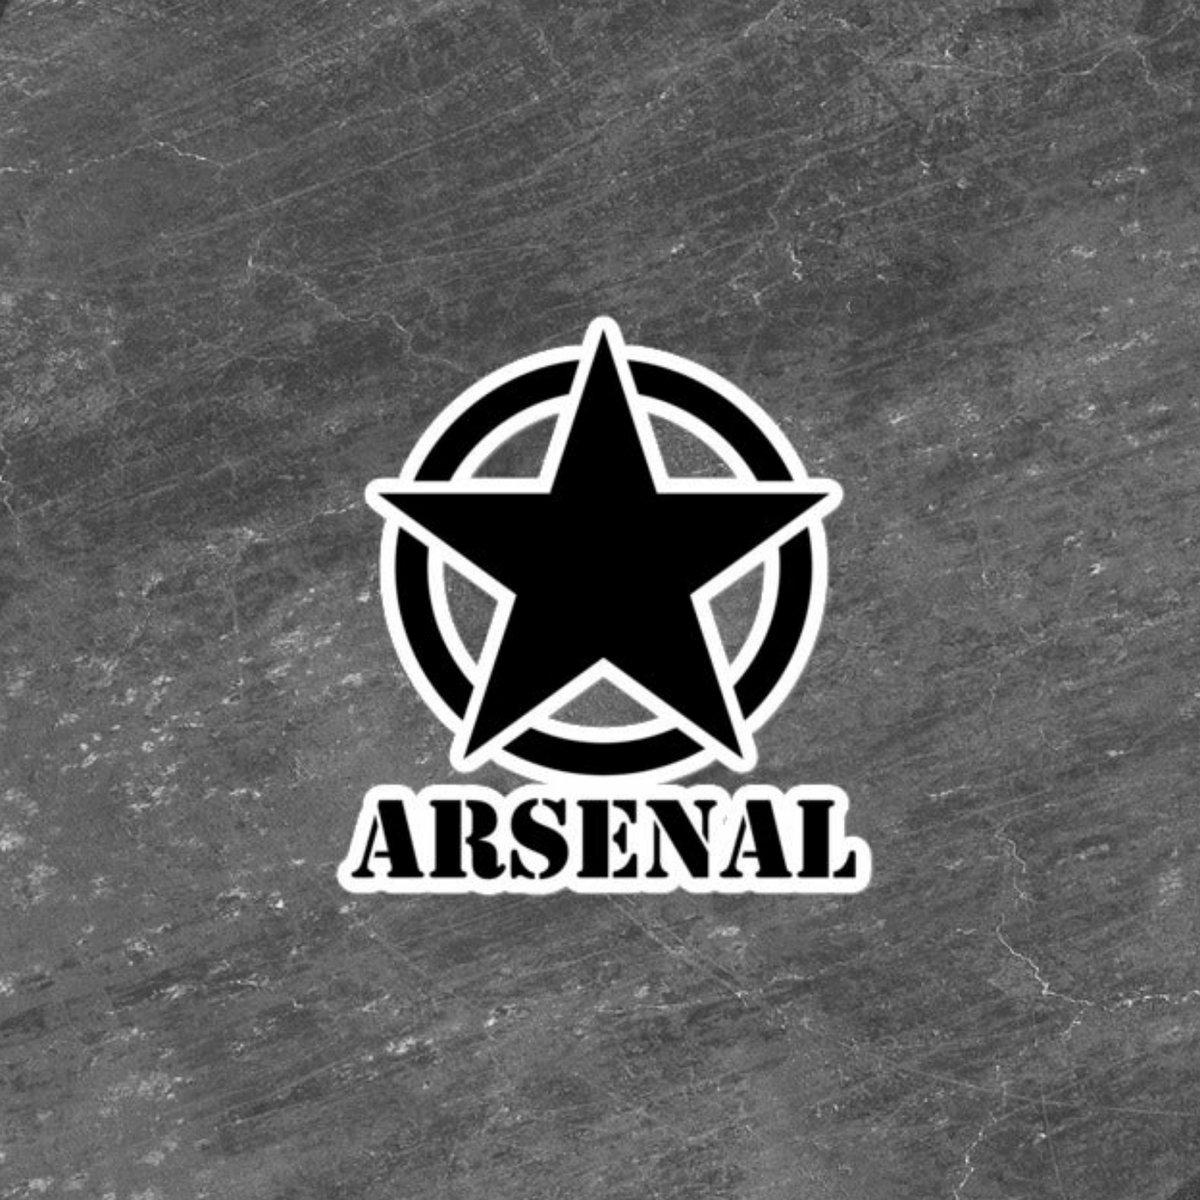 Image of Arsenal Army Sticker